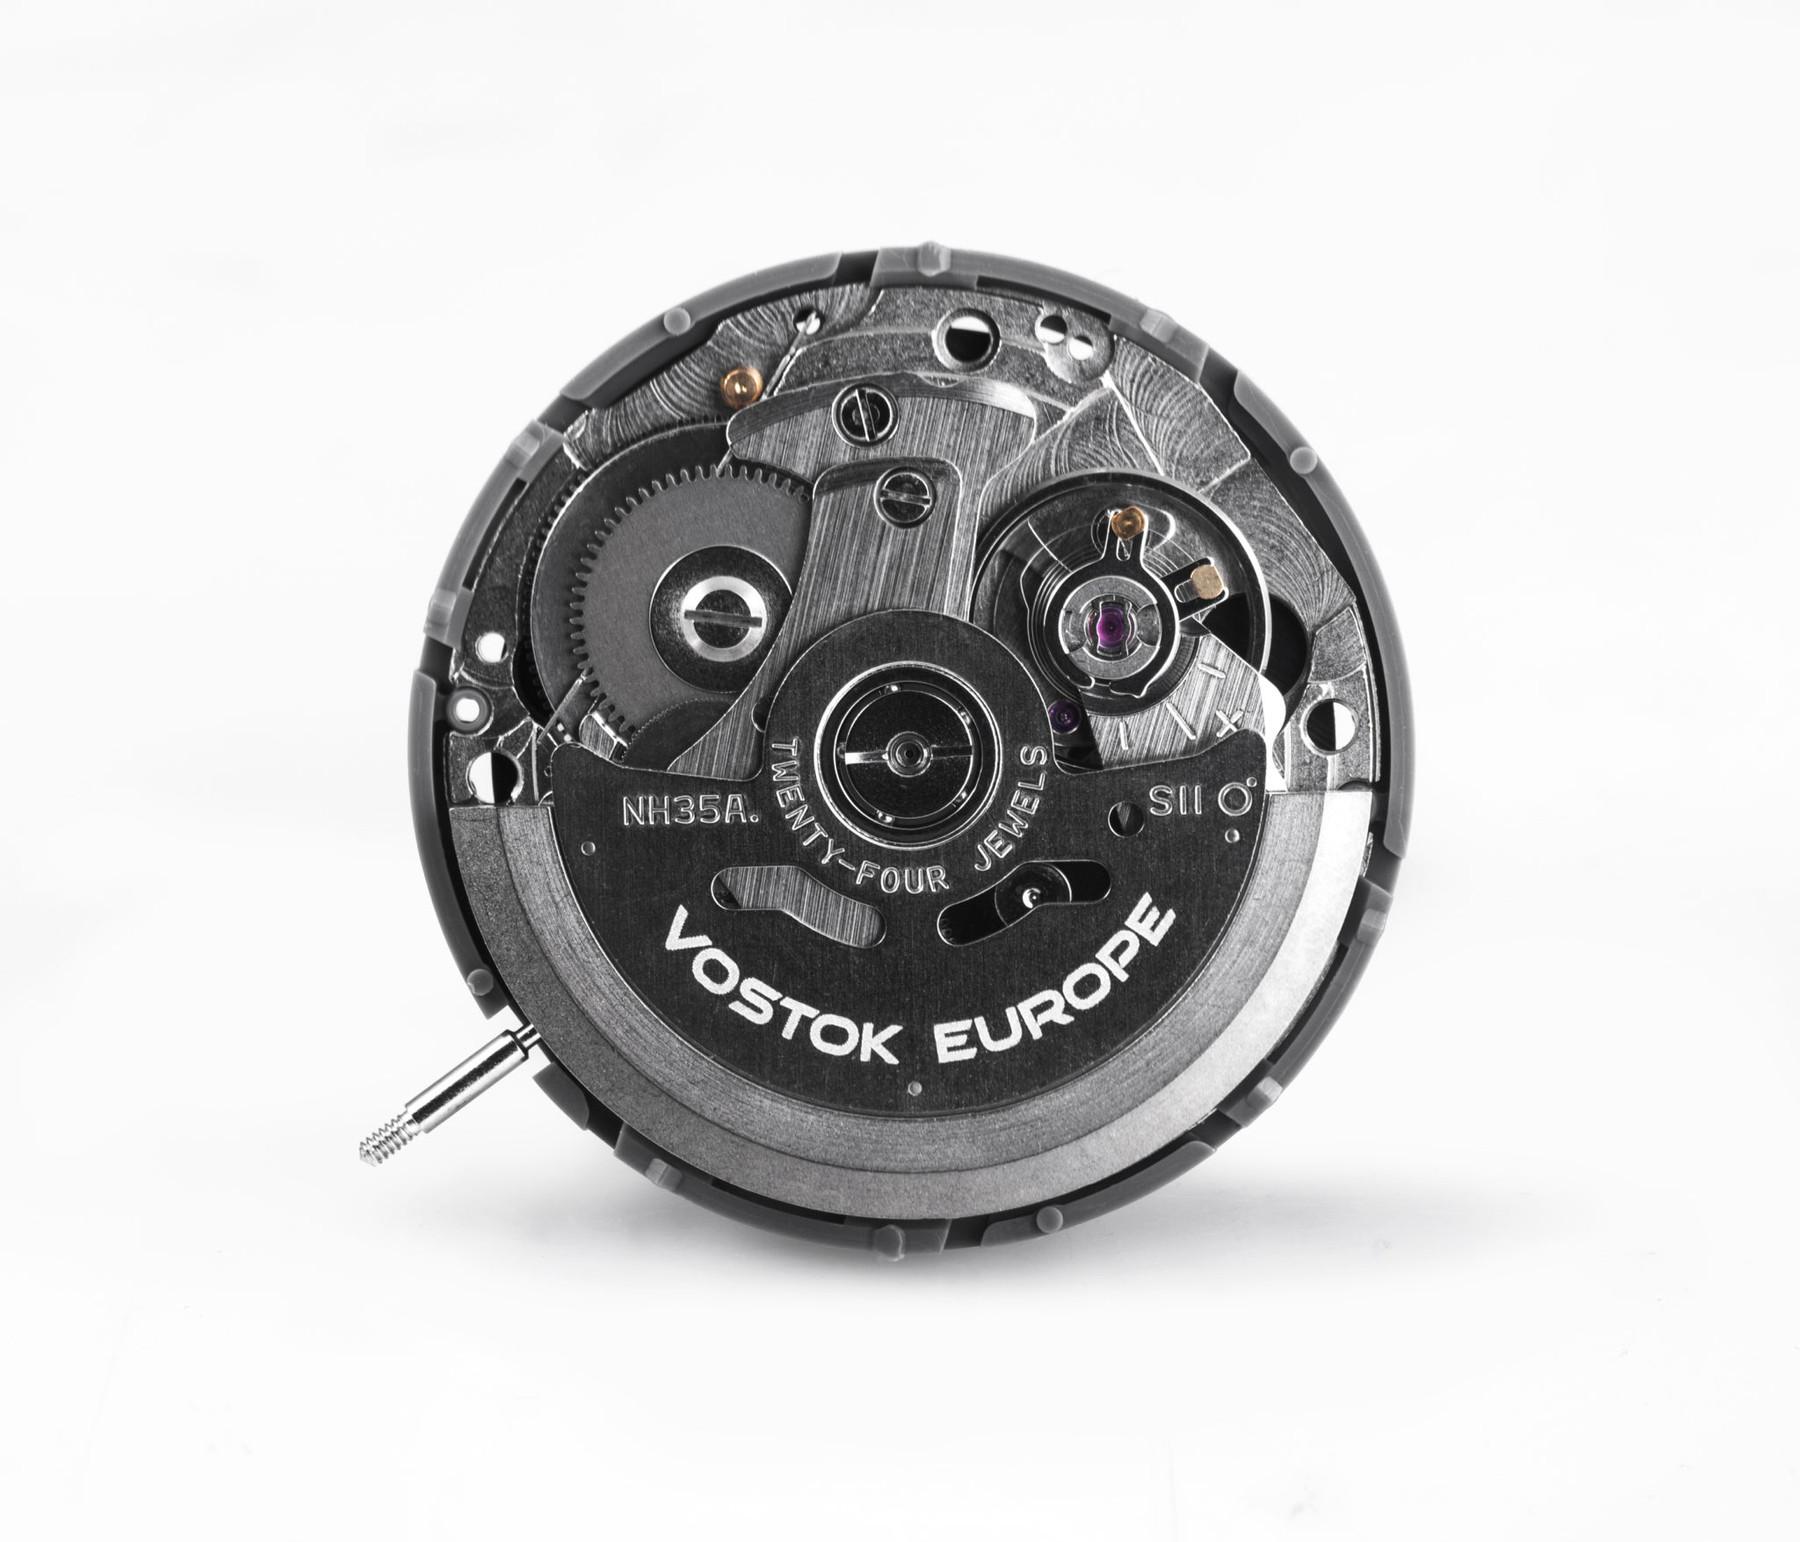 Bild 2 Vostok Europe Almaz NH35A-320C257 Automatikuhr mit Textilband